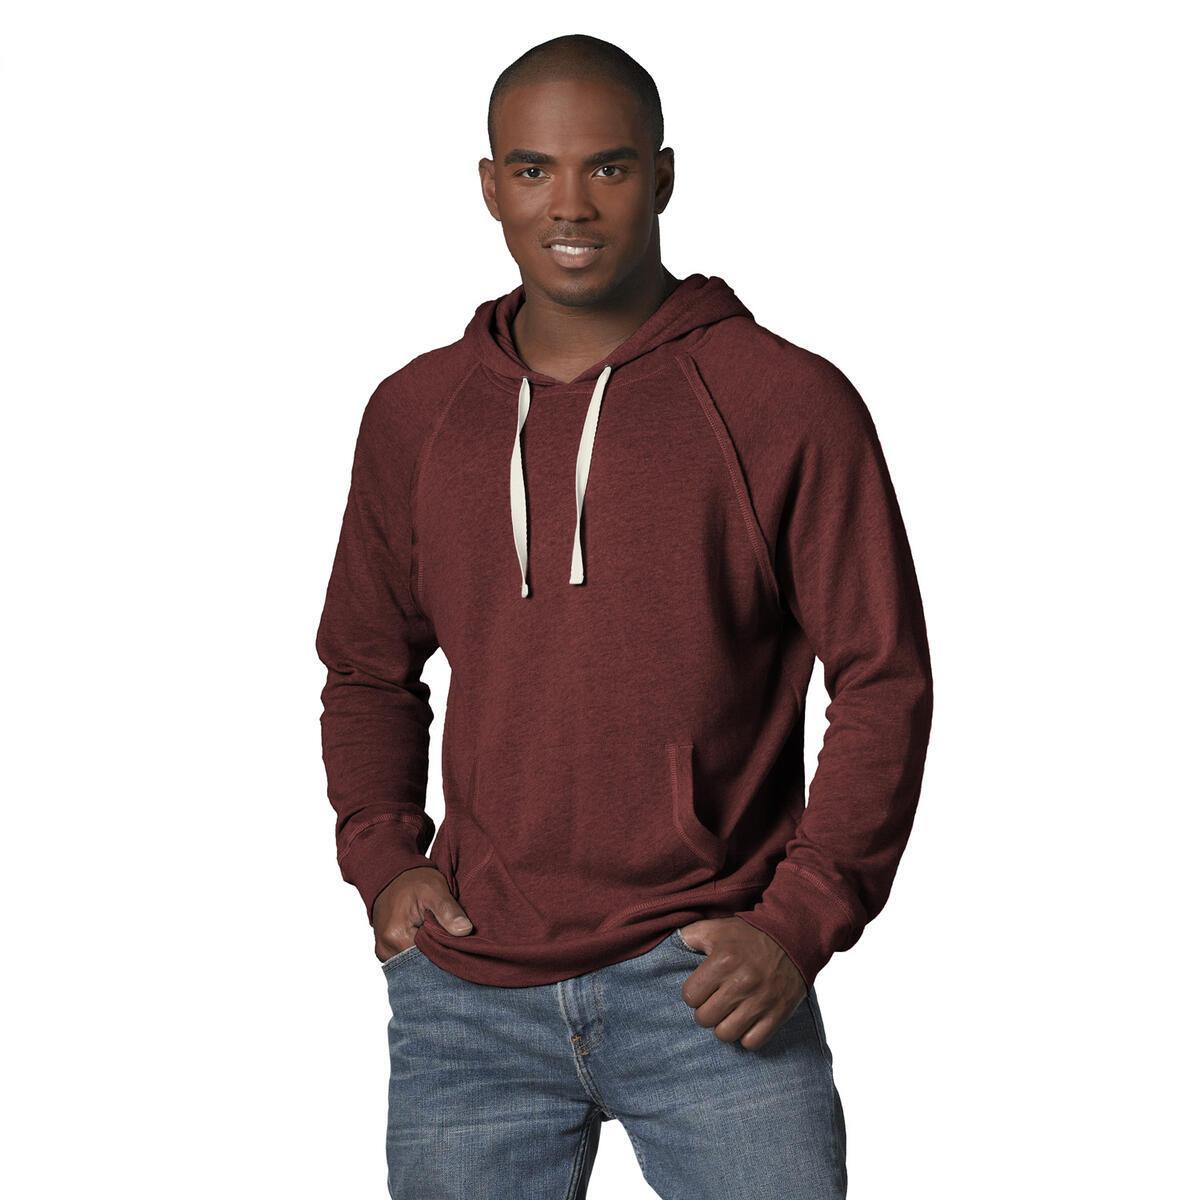 MV Sport Lightweight Hoodie Men (Ultimate Long Sleeve Hooded T Shirt Men) Slim Fit Shirt Men